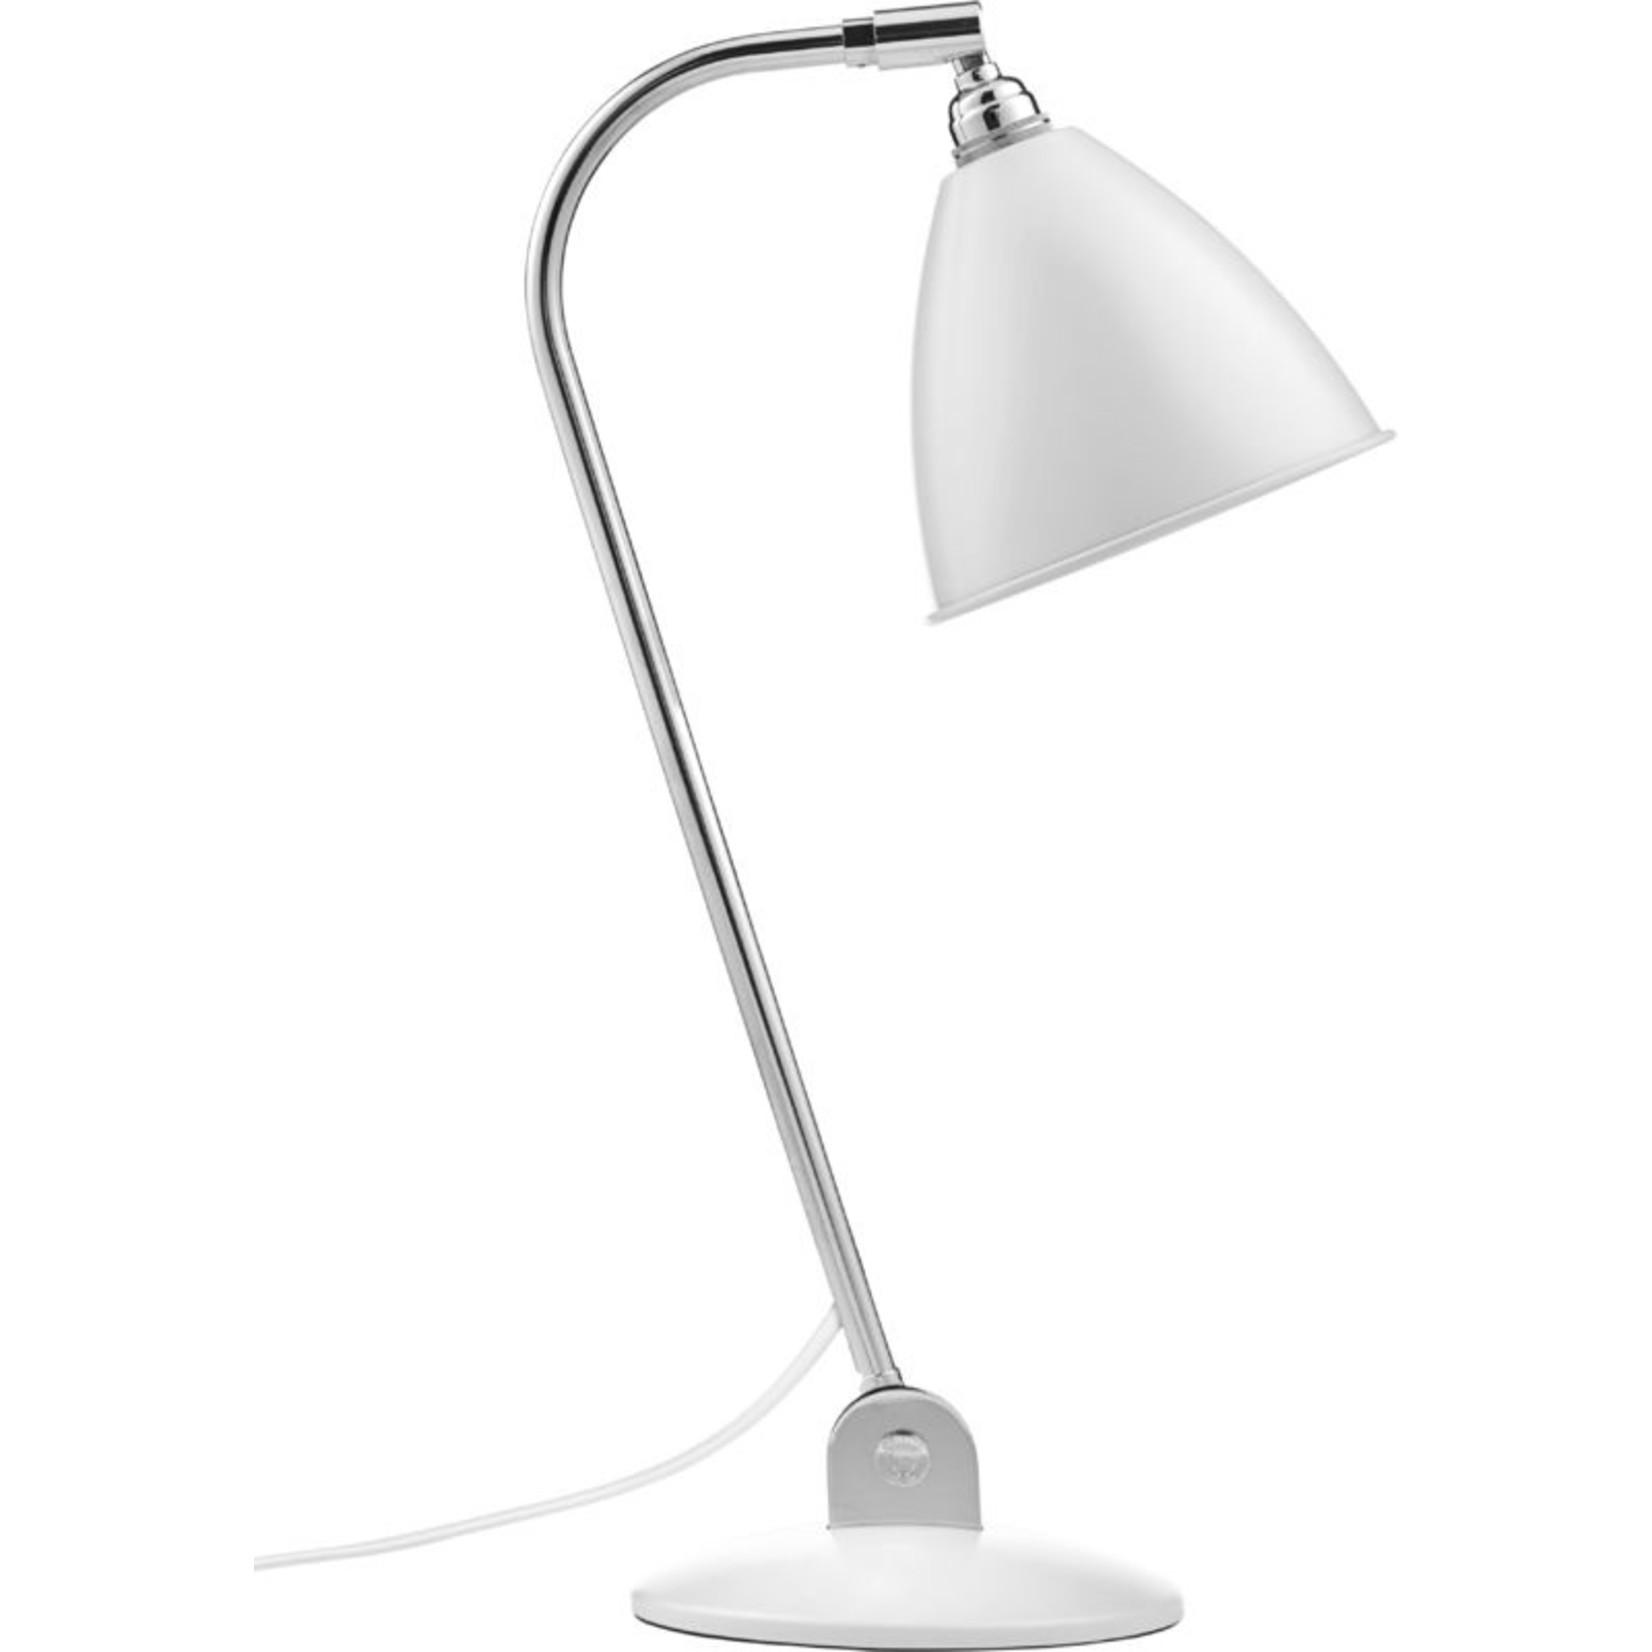 Gubi BL2 Table Lamp - Ø16 | Chrome Base & Soft White Semi Matt Shade